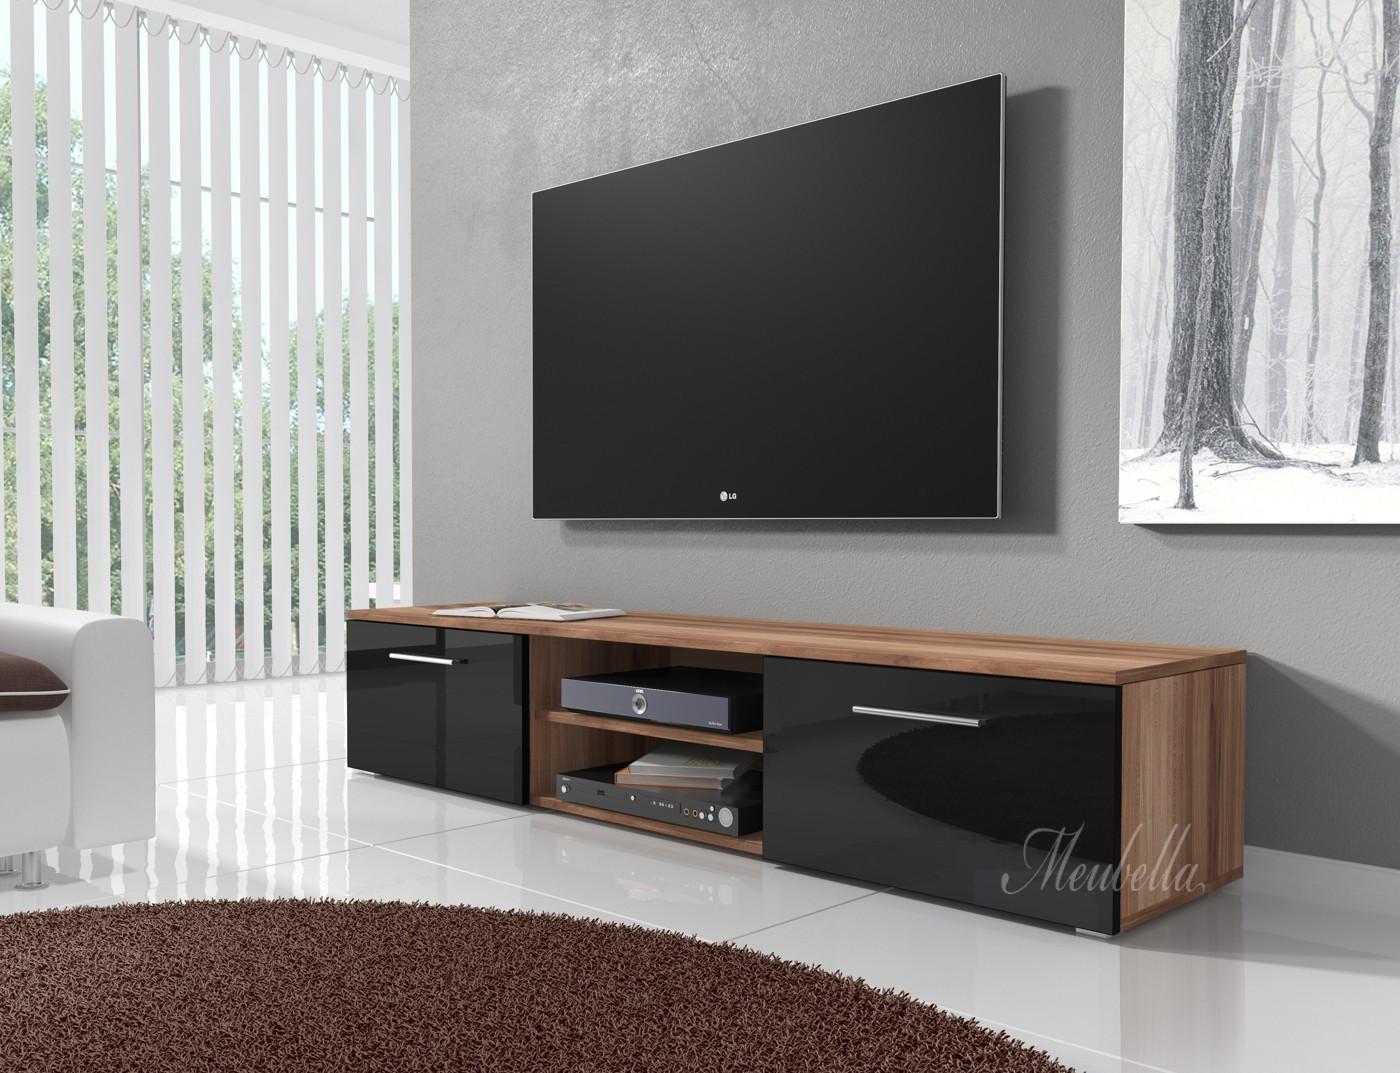 Tv meubel basura i zwart eiken 160 cm meubella for Showroommodellen design meubels